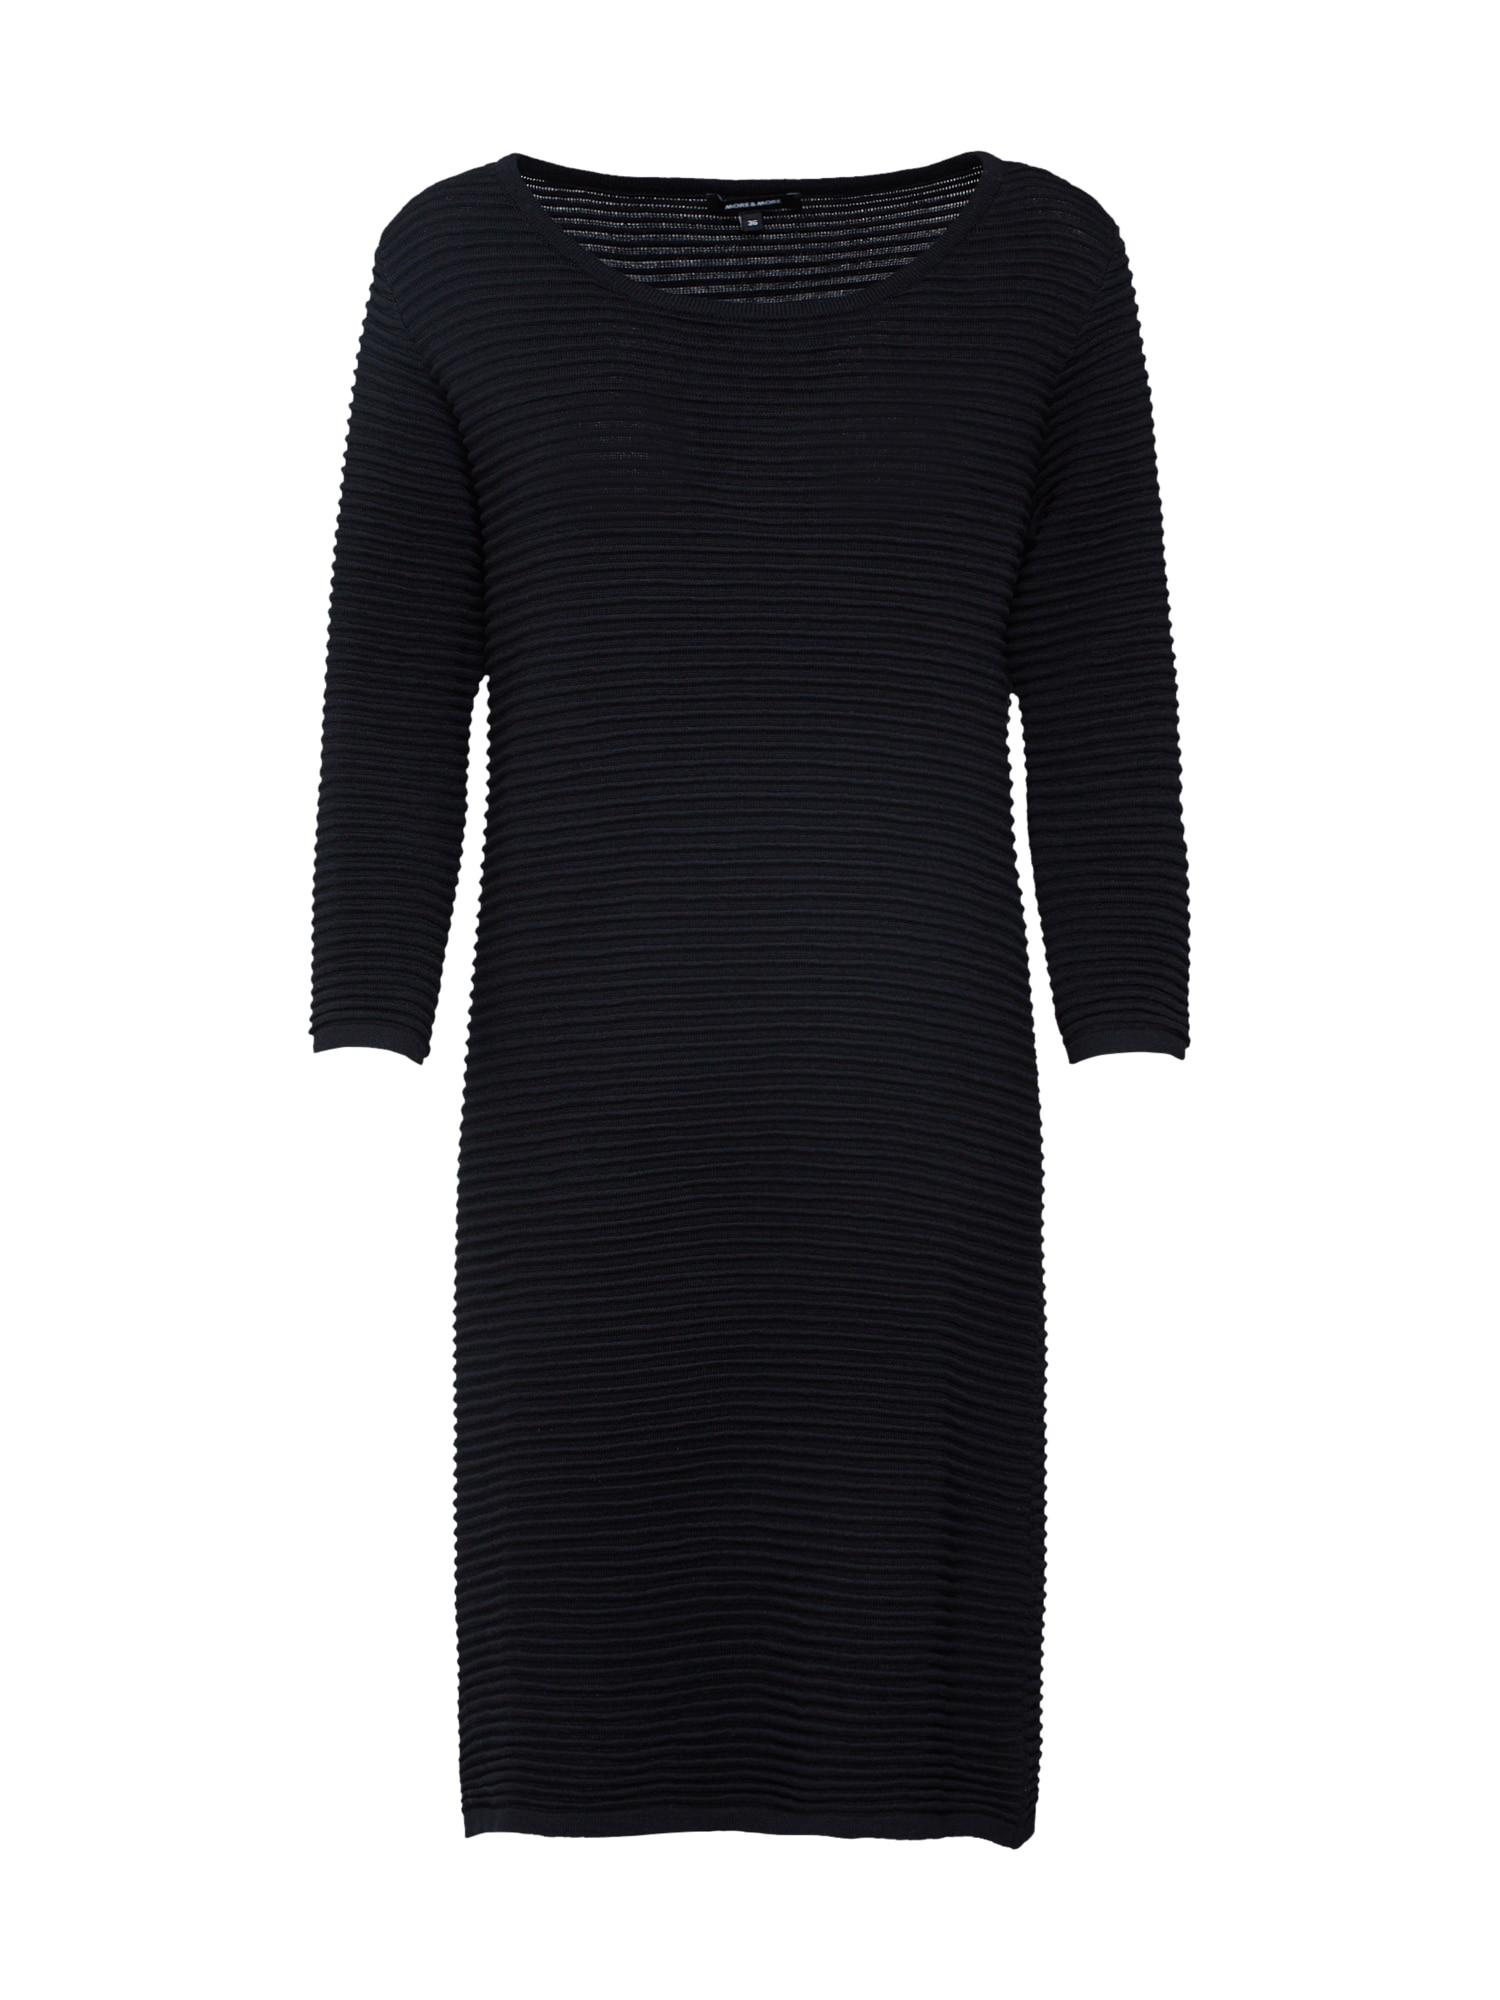 MORE & MORE Úpletové šaty  černá